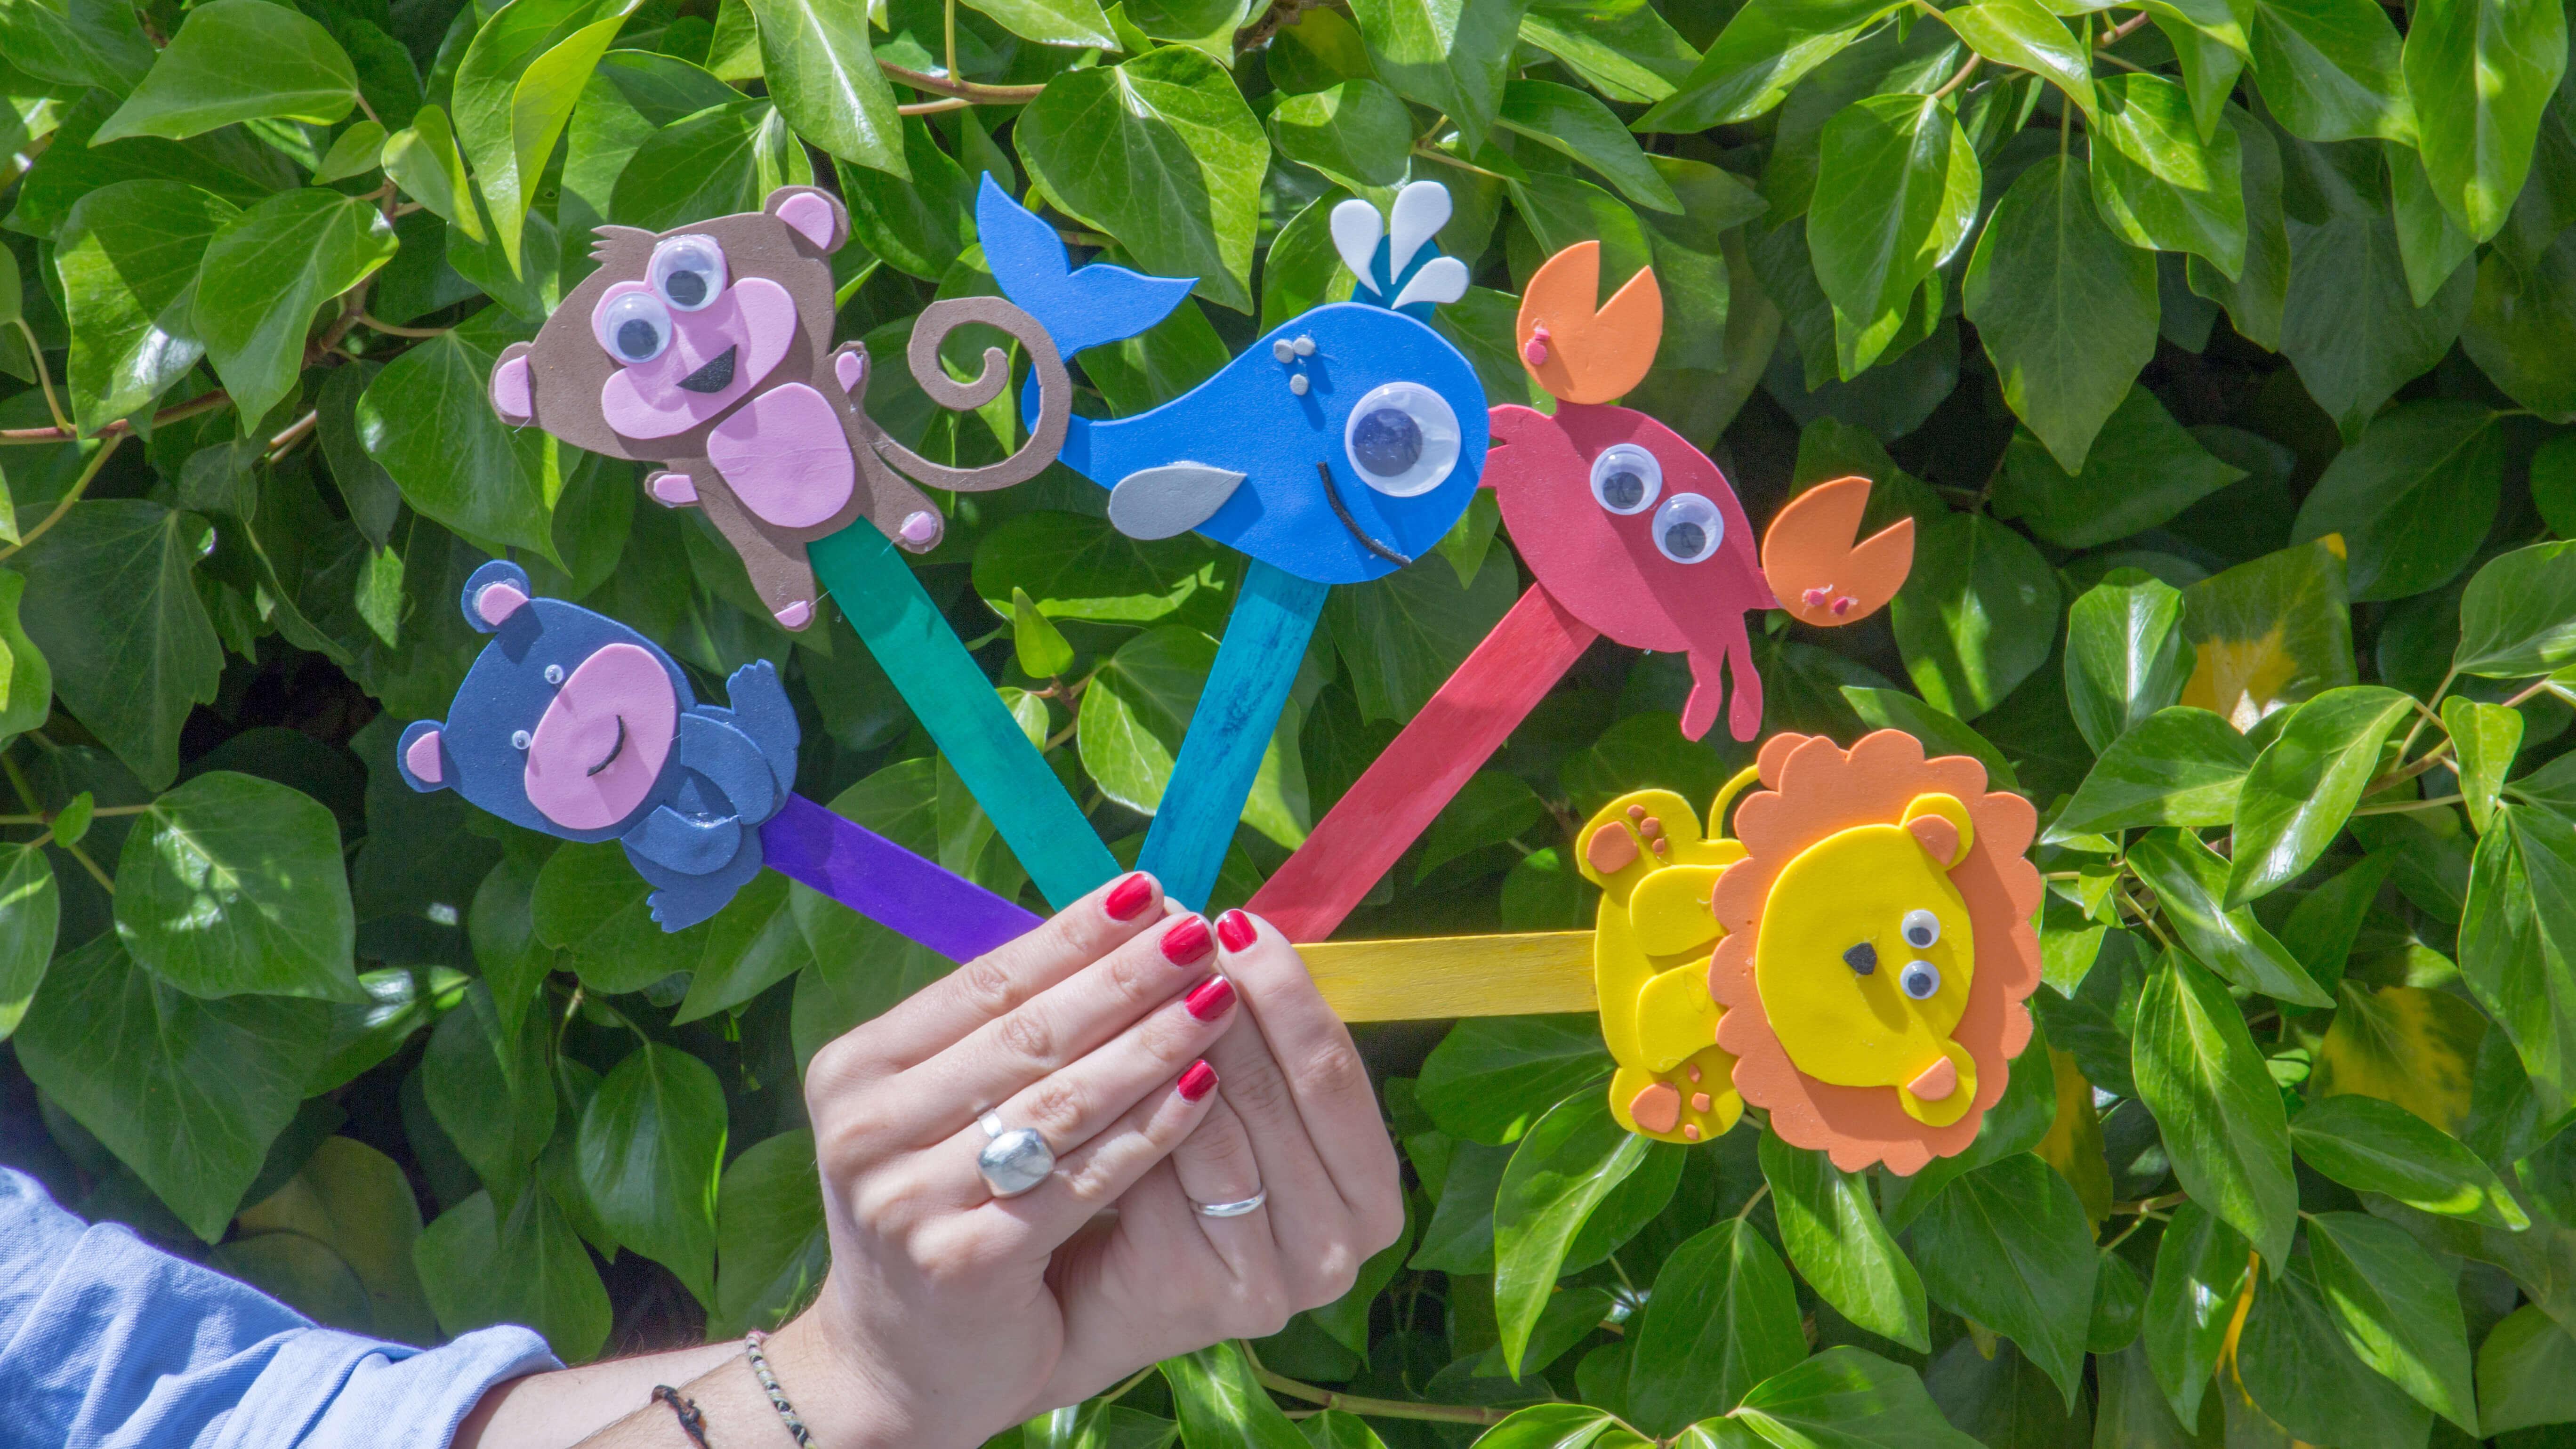 manualidades-para-ninos-de-3-a-5-anos-marionetas-con-palitos-de-helado